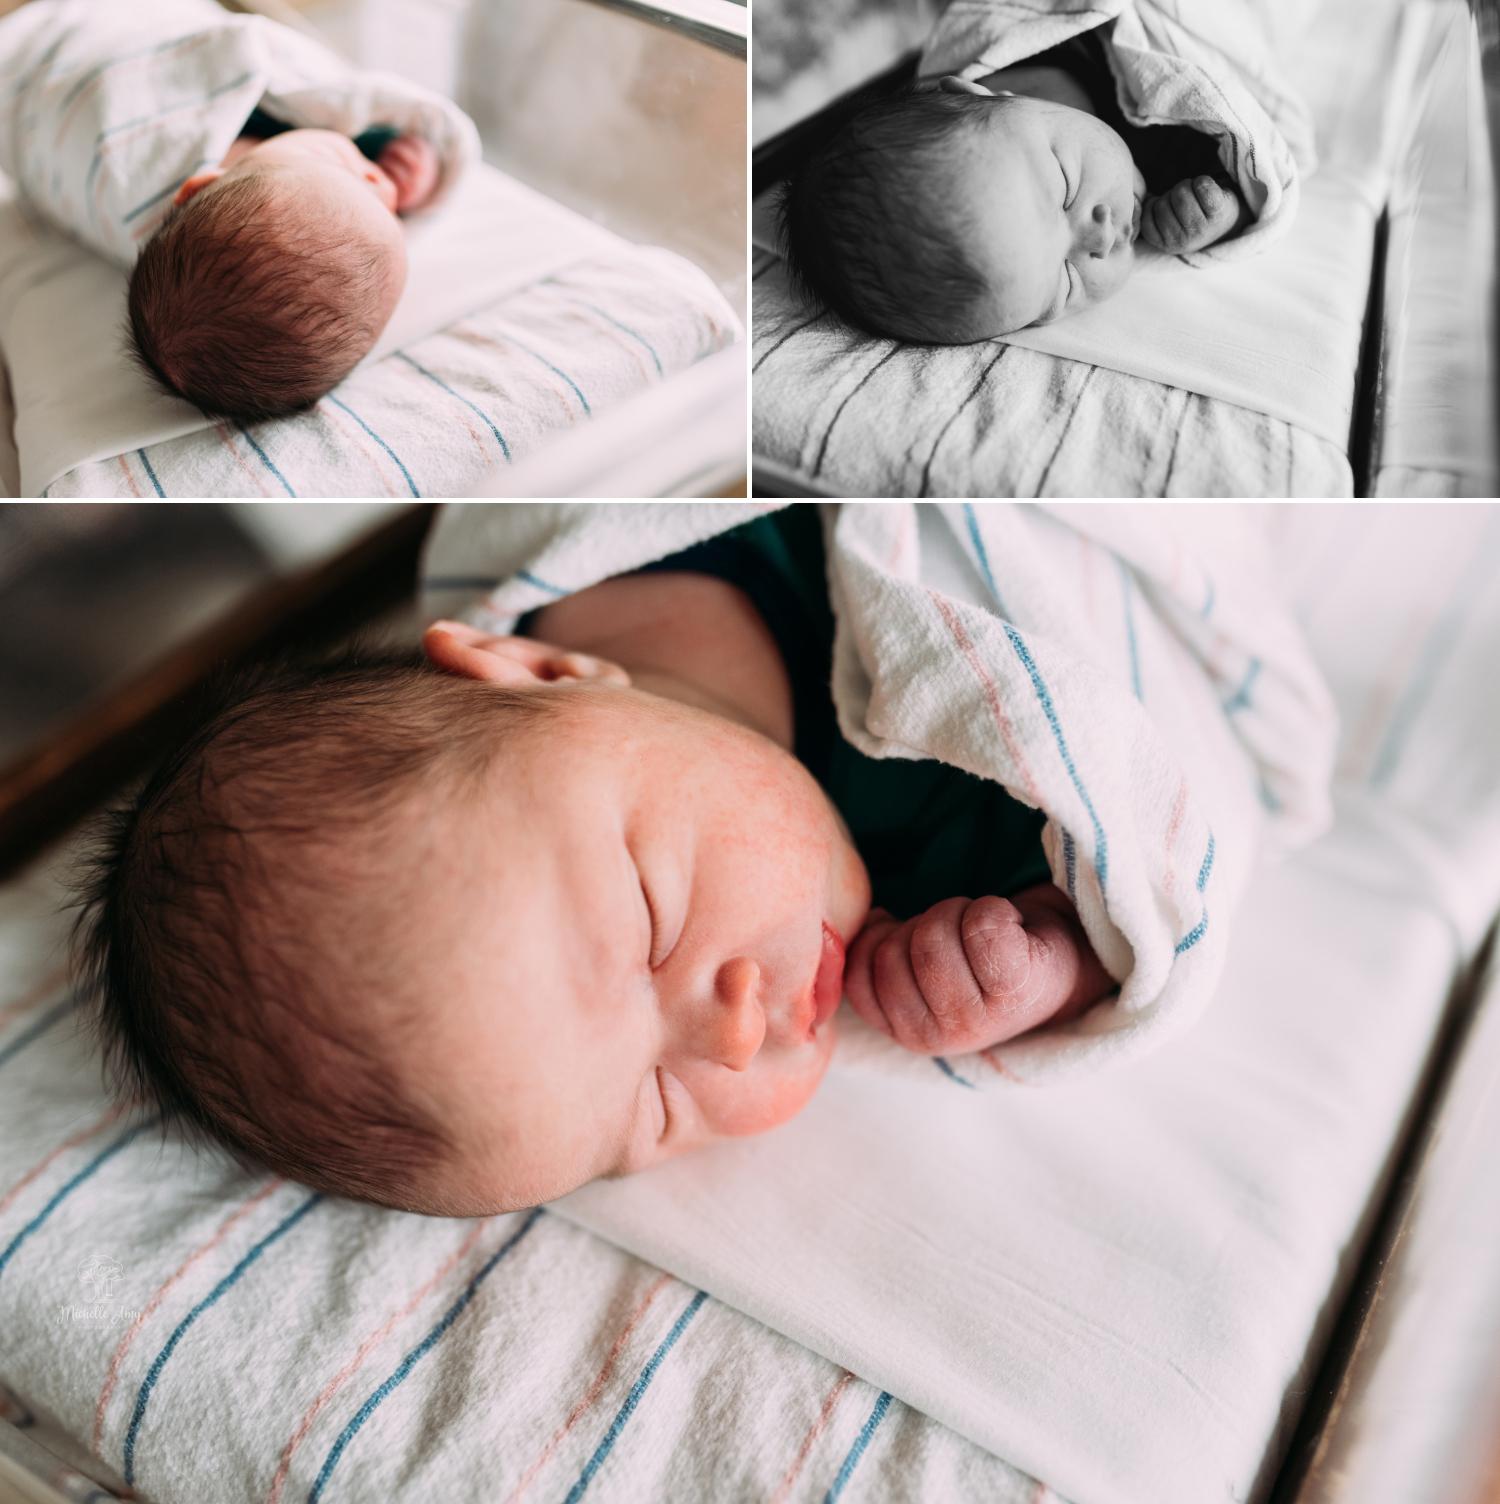 Monmouth County NJ Fresh 48 newborn photos 4.jpg